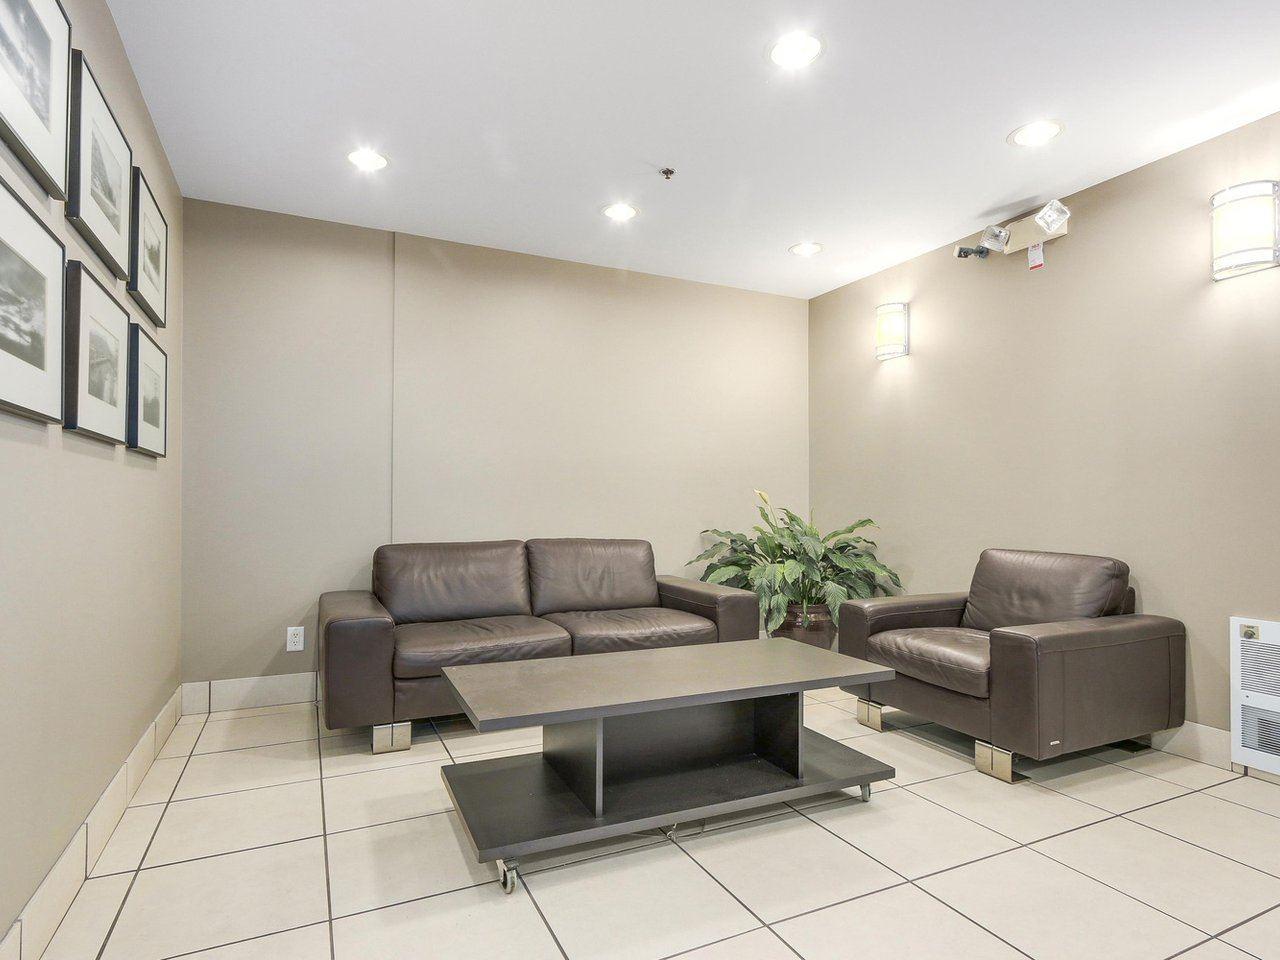 Condo Apartment at 211 3811 HASTINGS STREET, Unit 211, Burnaby North, British Columbia. Image 3